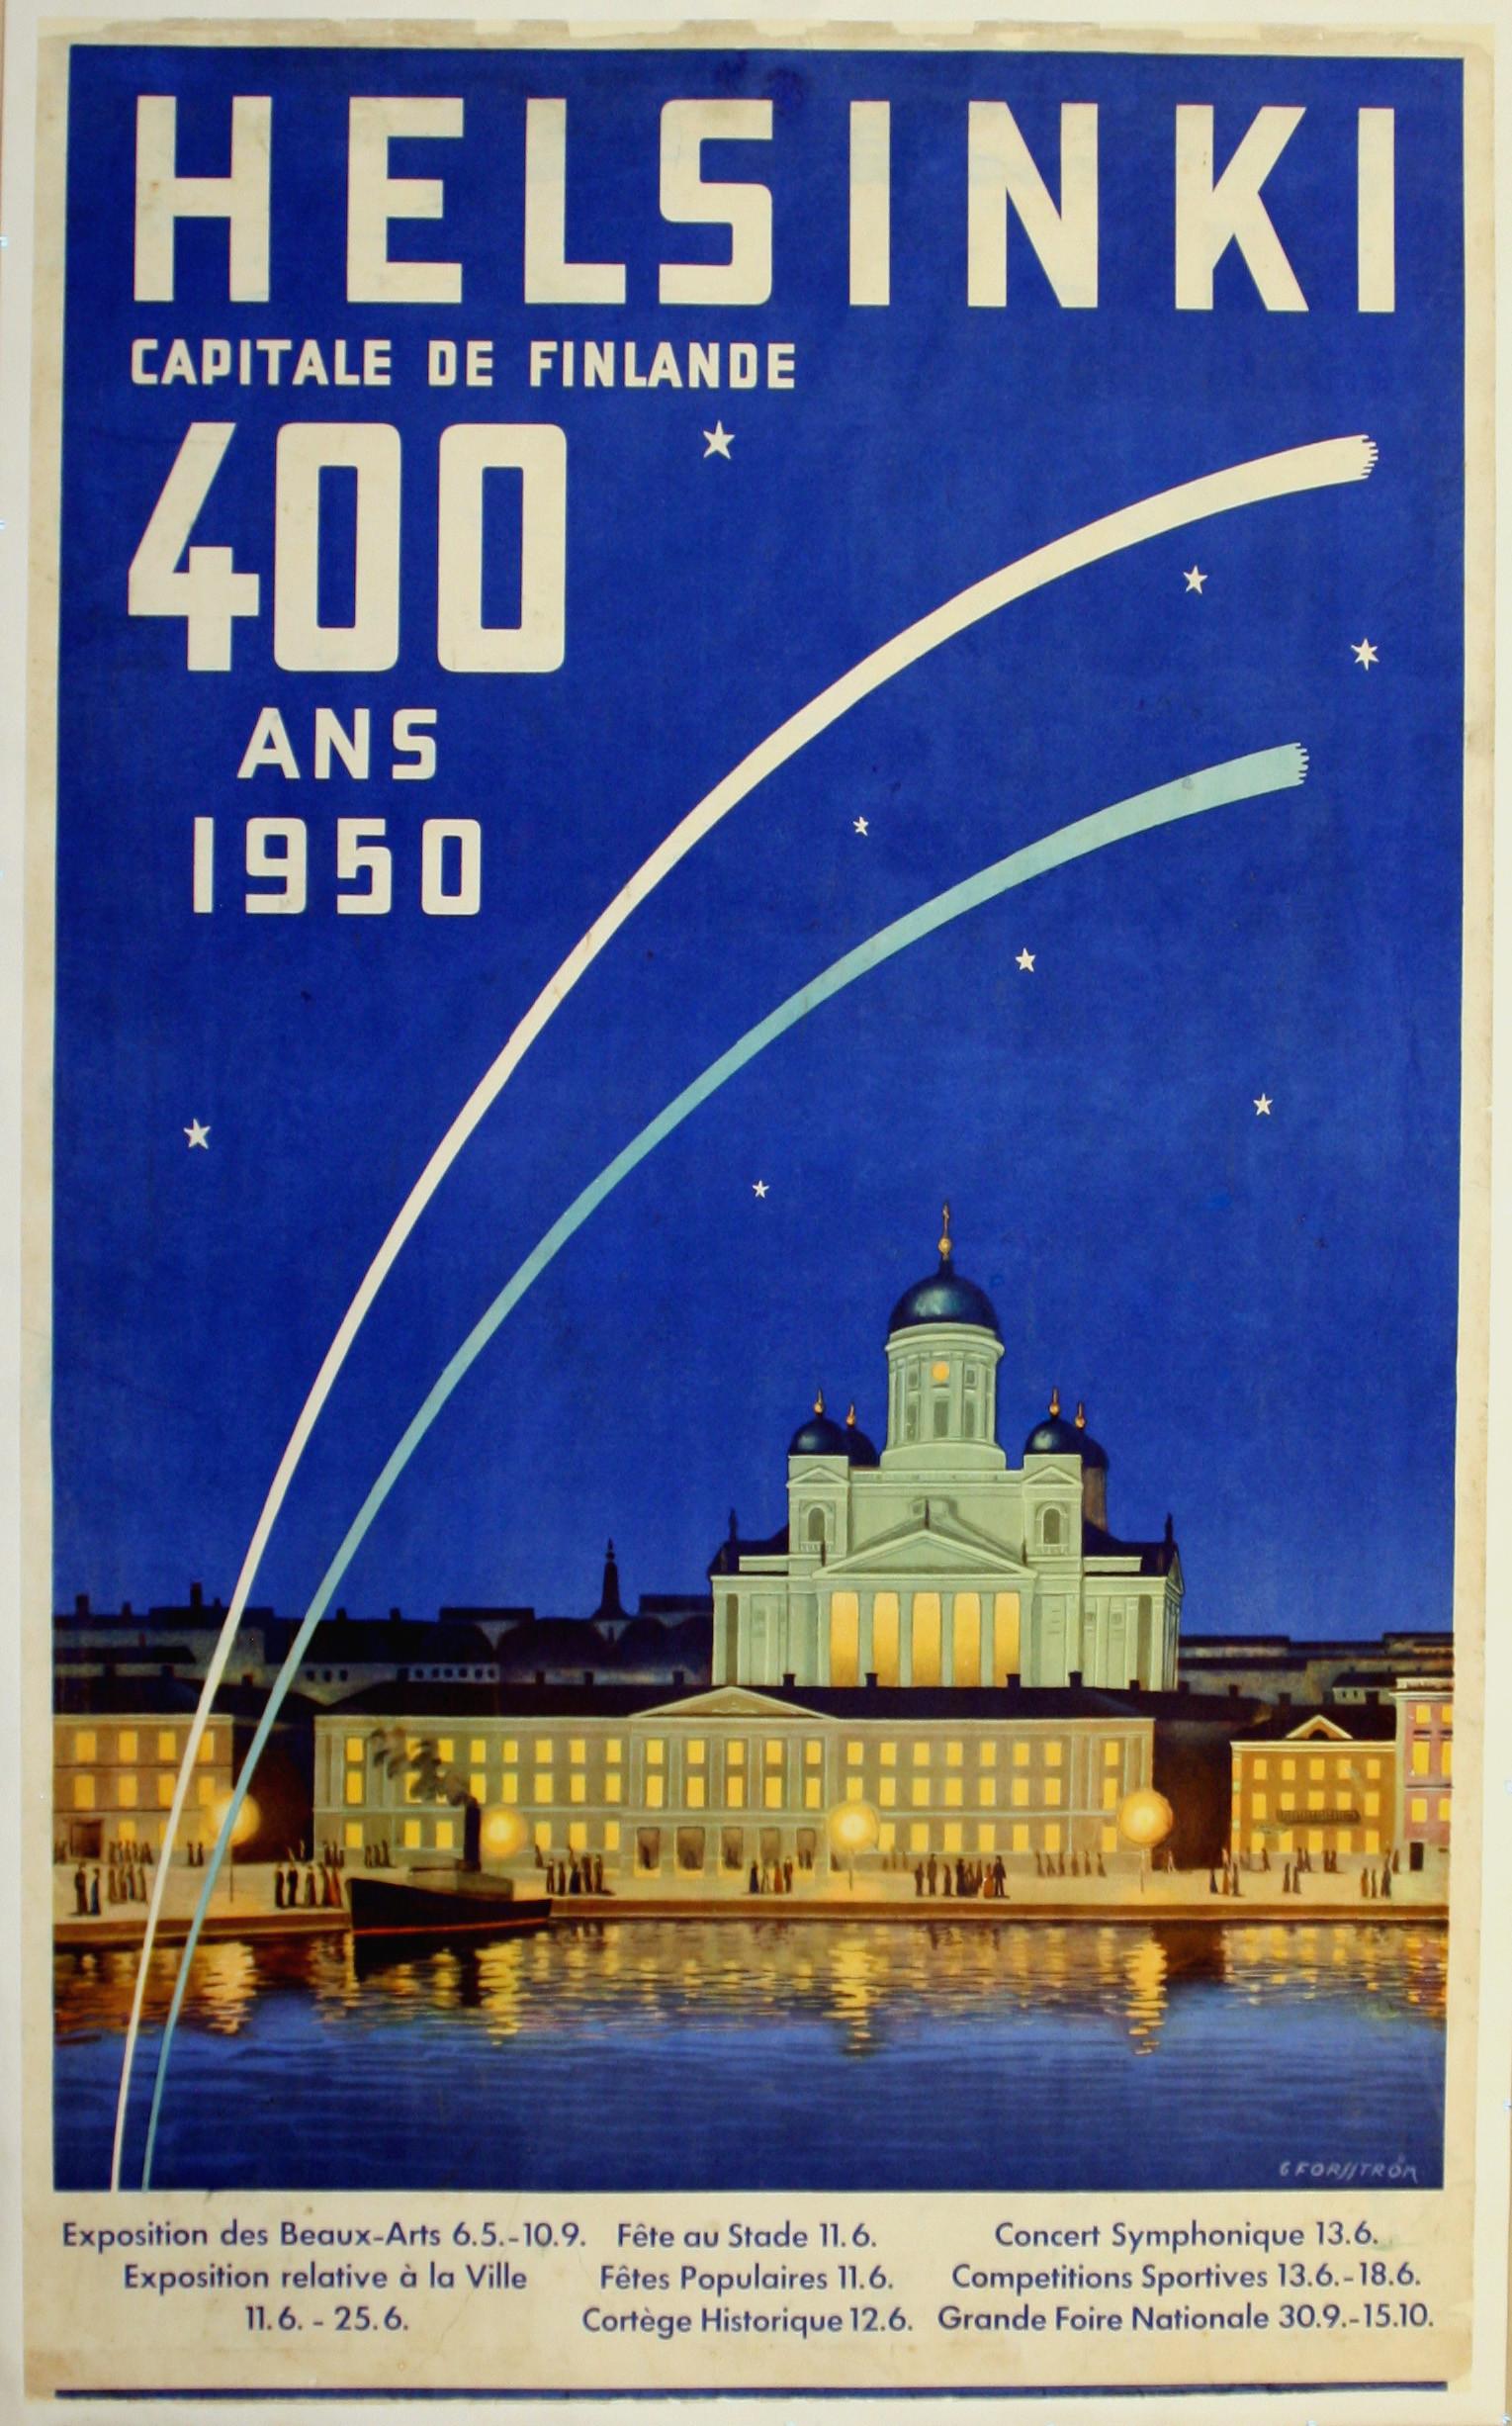 travel-poster-helsinki-finland - Copy.jpg